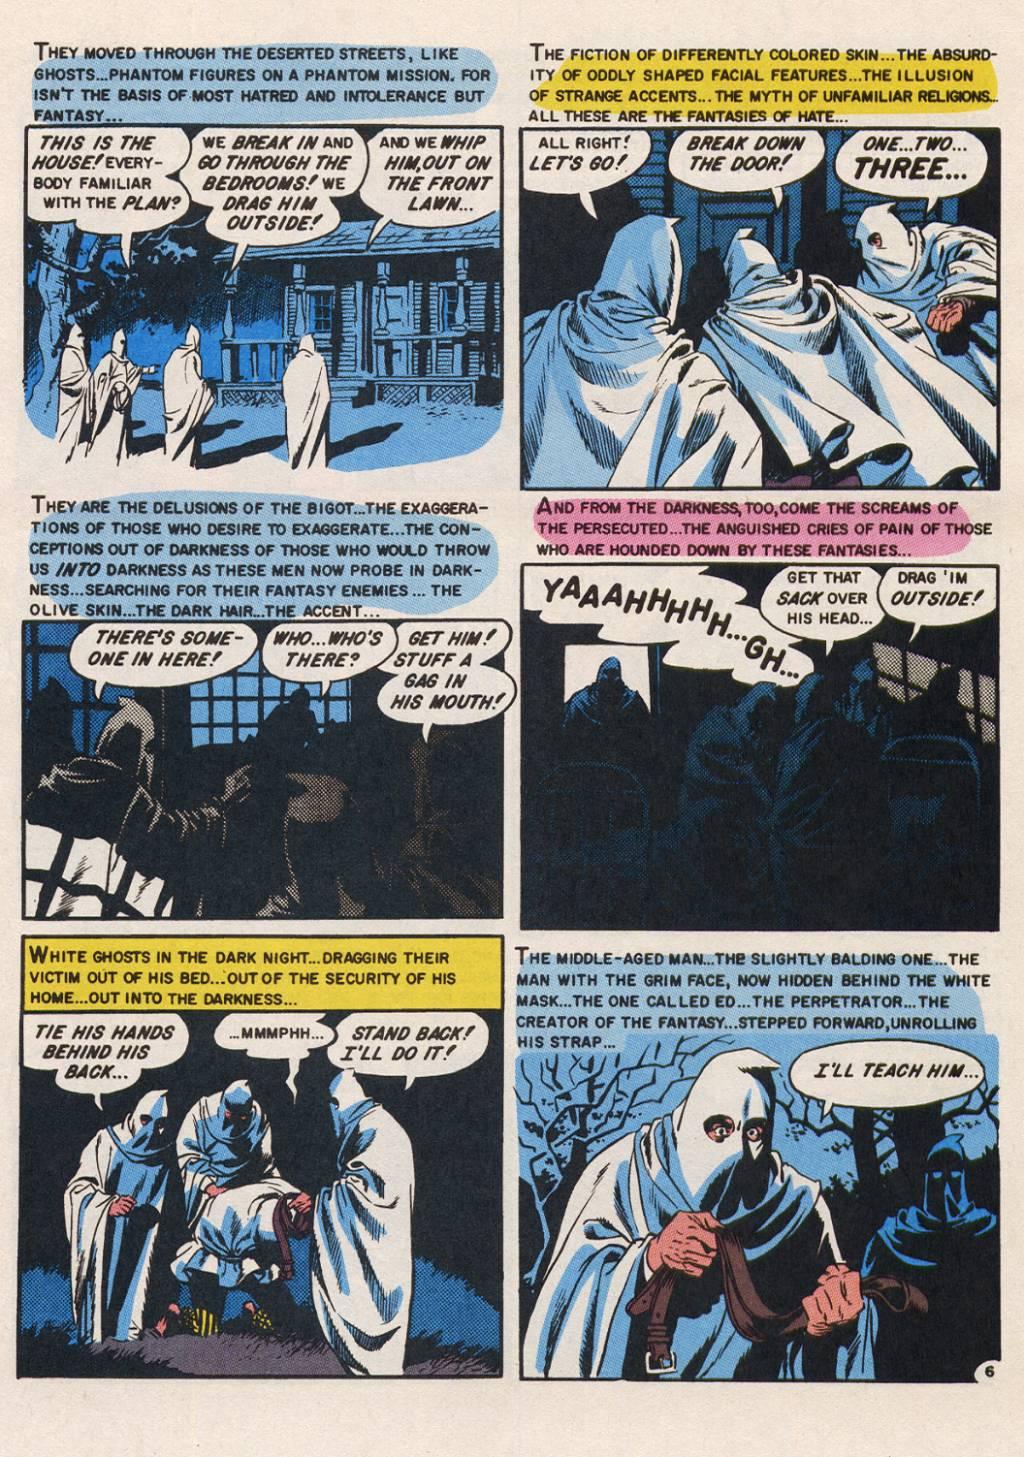 Read online Shock SuspenStories comic -  Issue #14 - 15